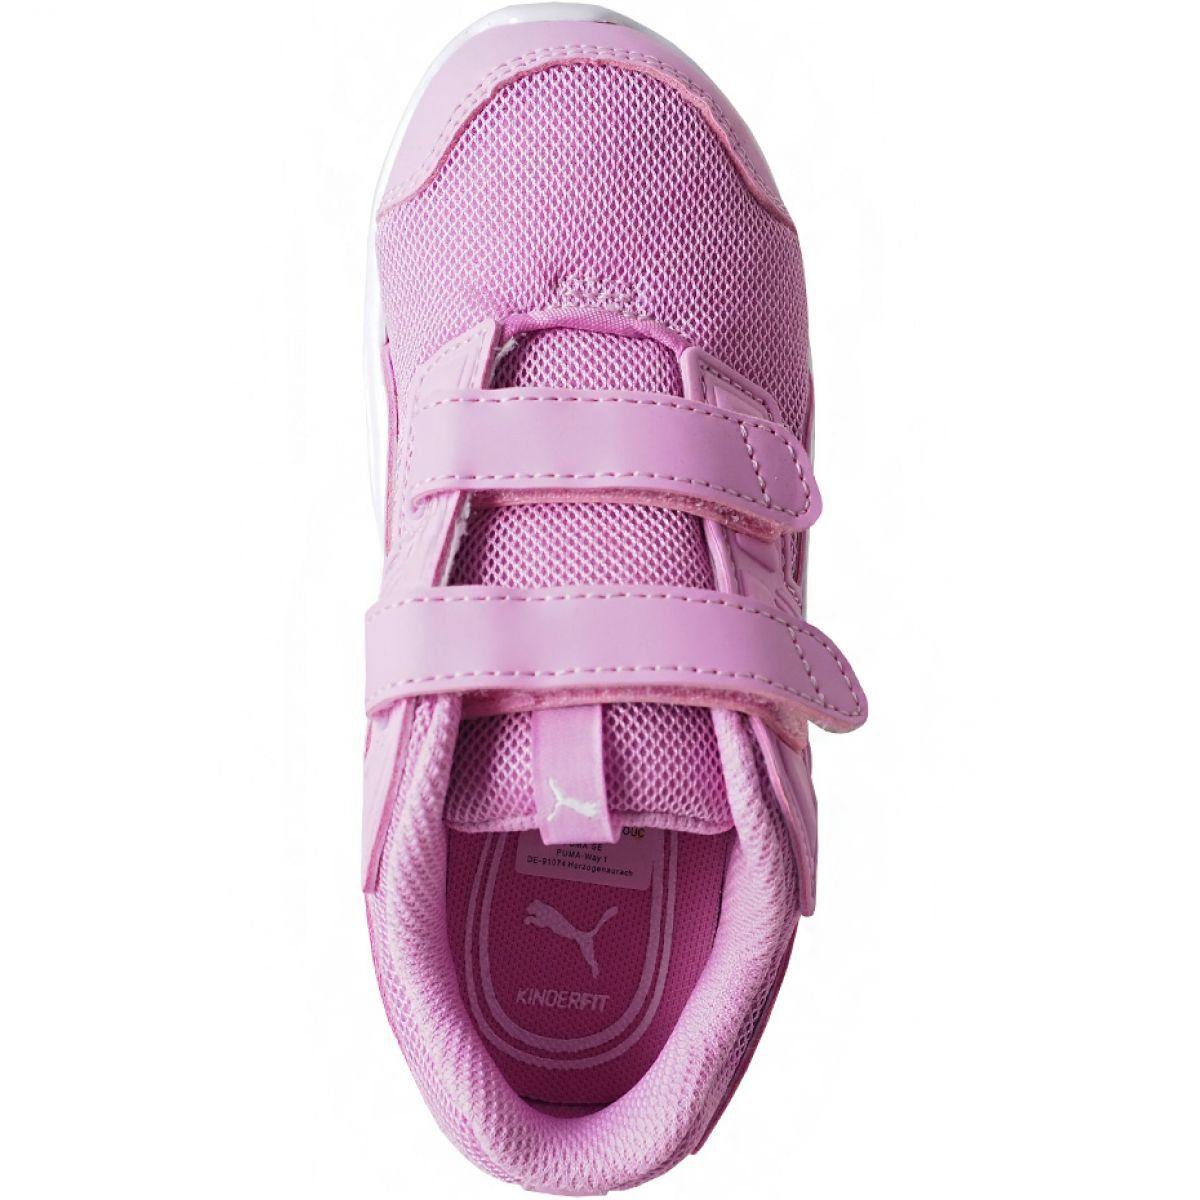 Buty Puma Escaper Mesh V Inf Jr 190327 09 Rozowe Kid Shoes Childrens Shoes Shoes